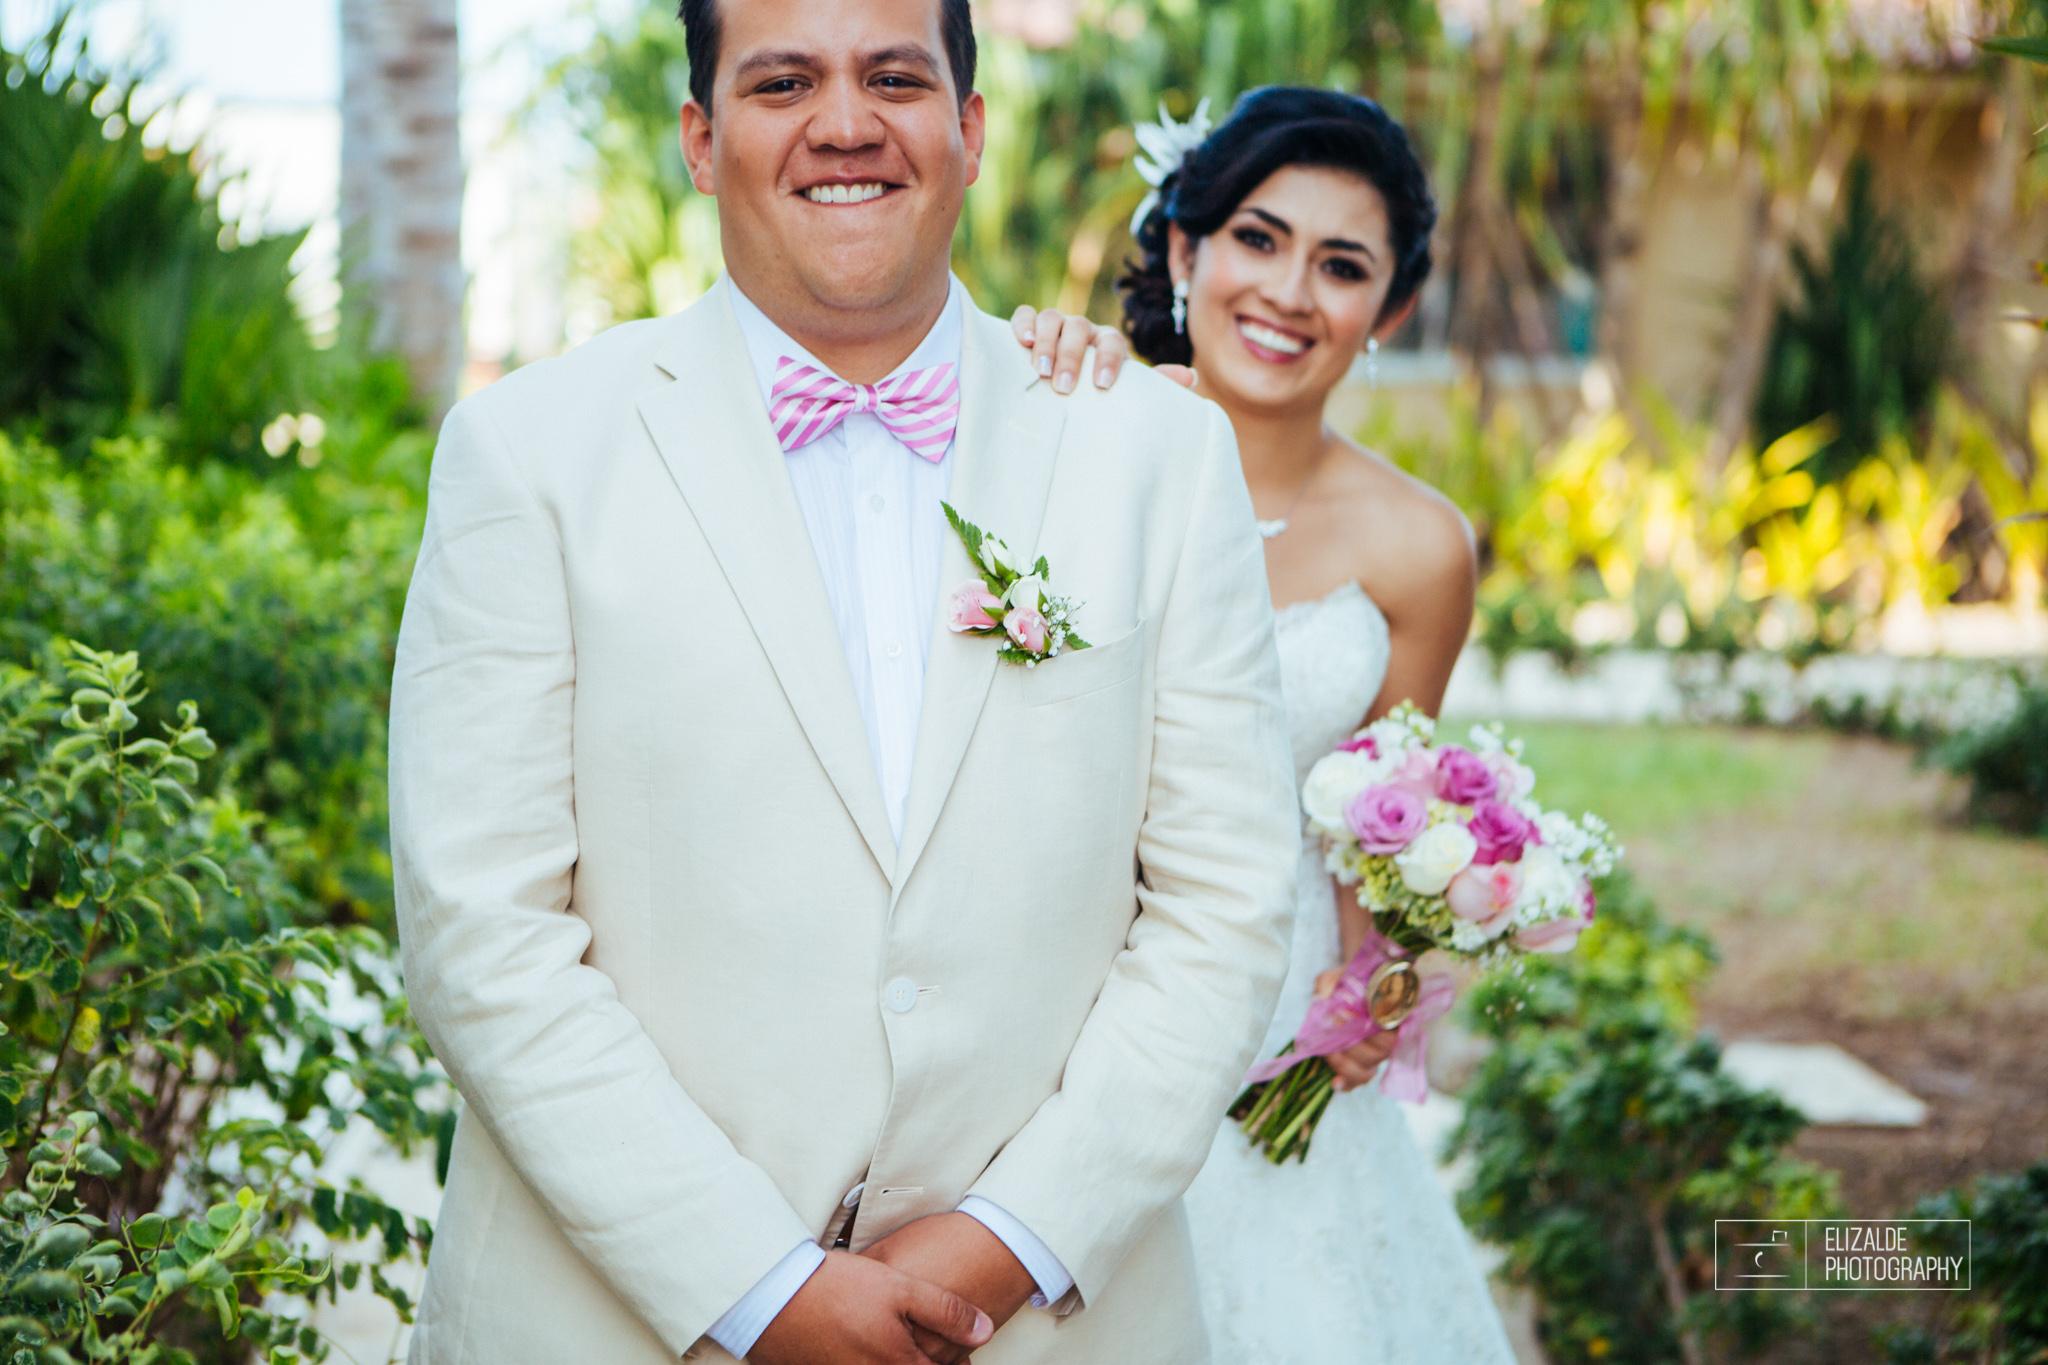 Pay and Ferran_Acapulco_Destination Wedding_Elizalde Photography-57.jpg